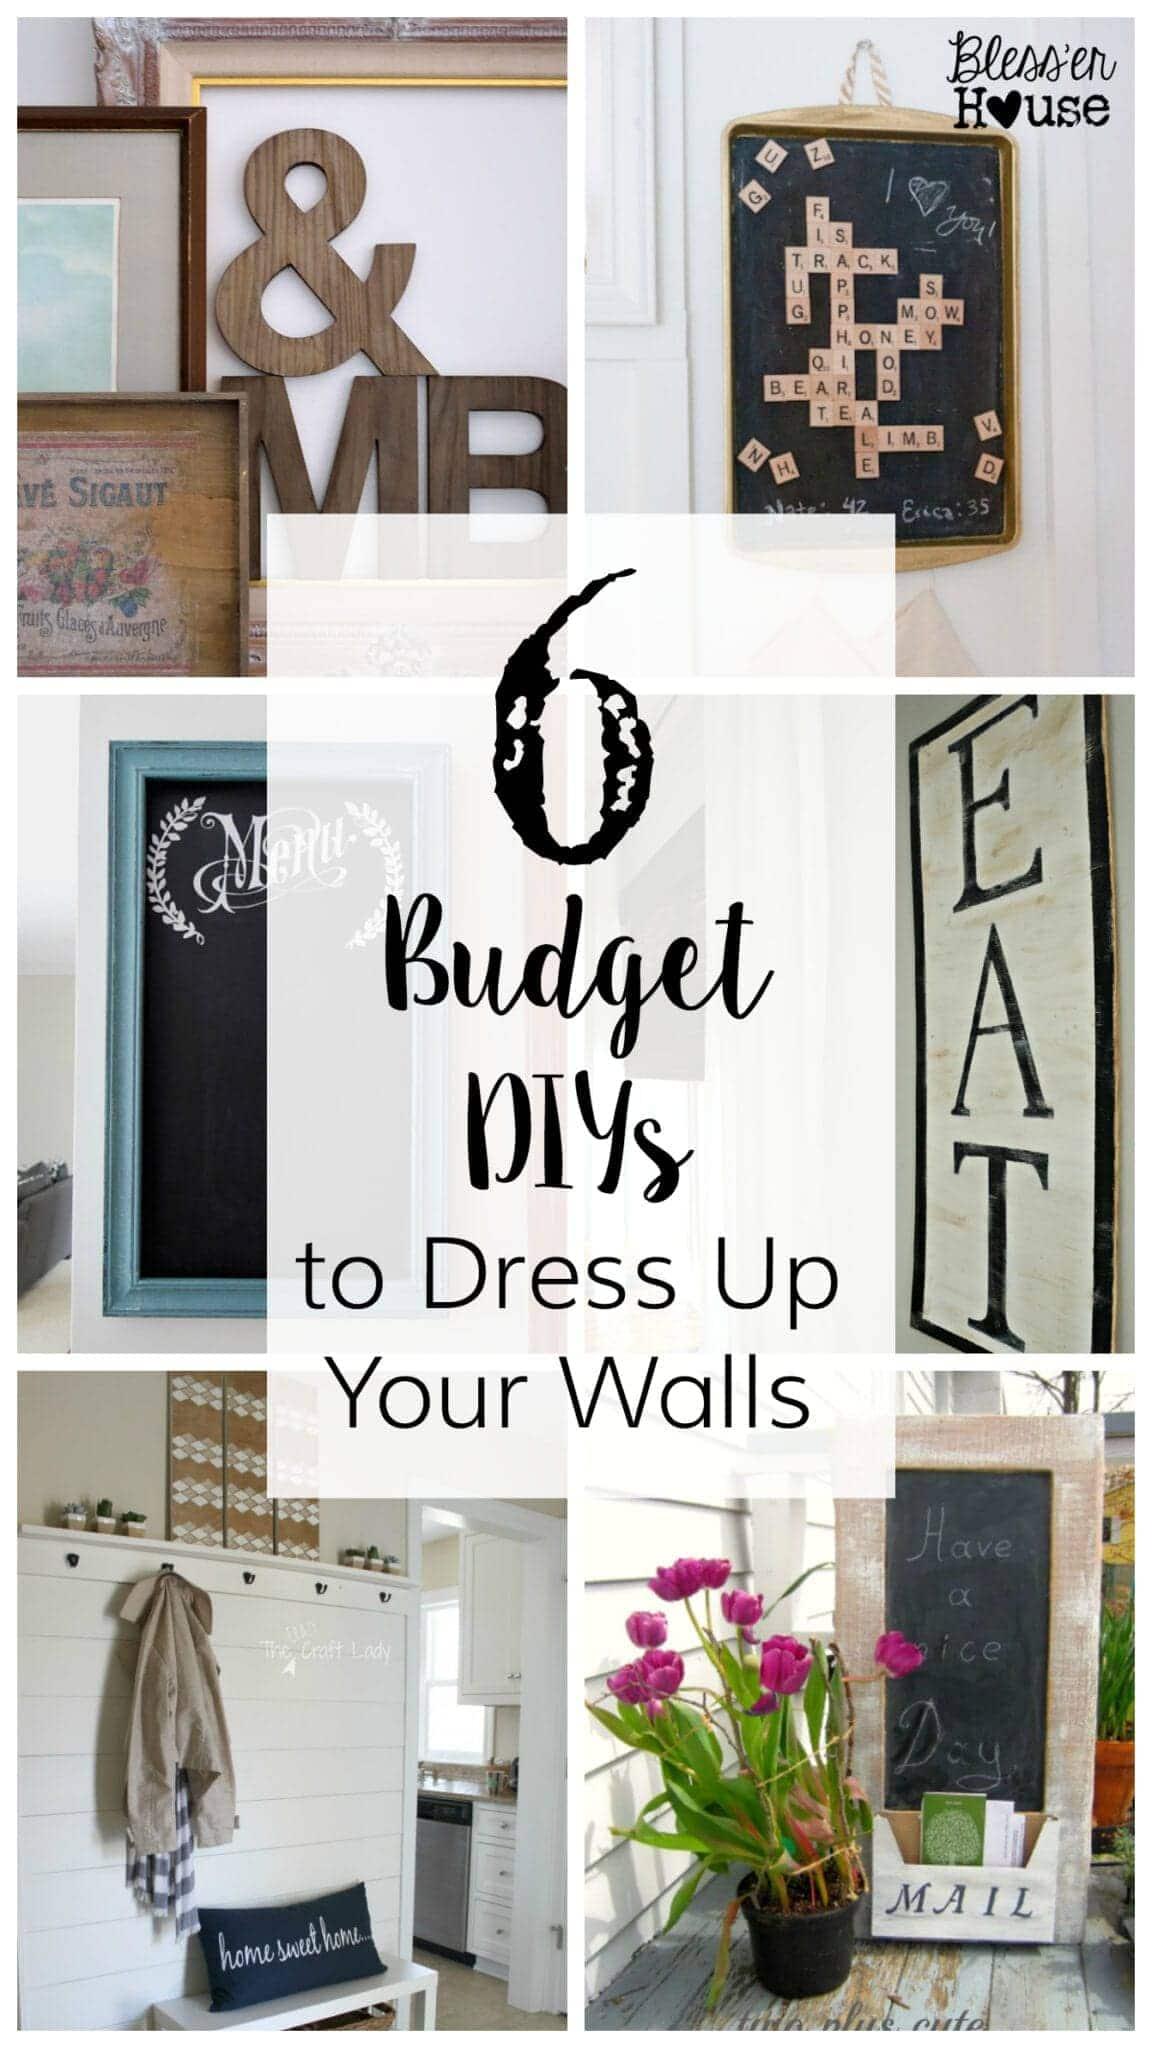 6 Budget DIYs to Dress Up Your Walls + YTTS #28